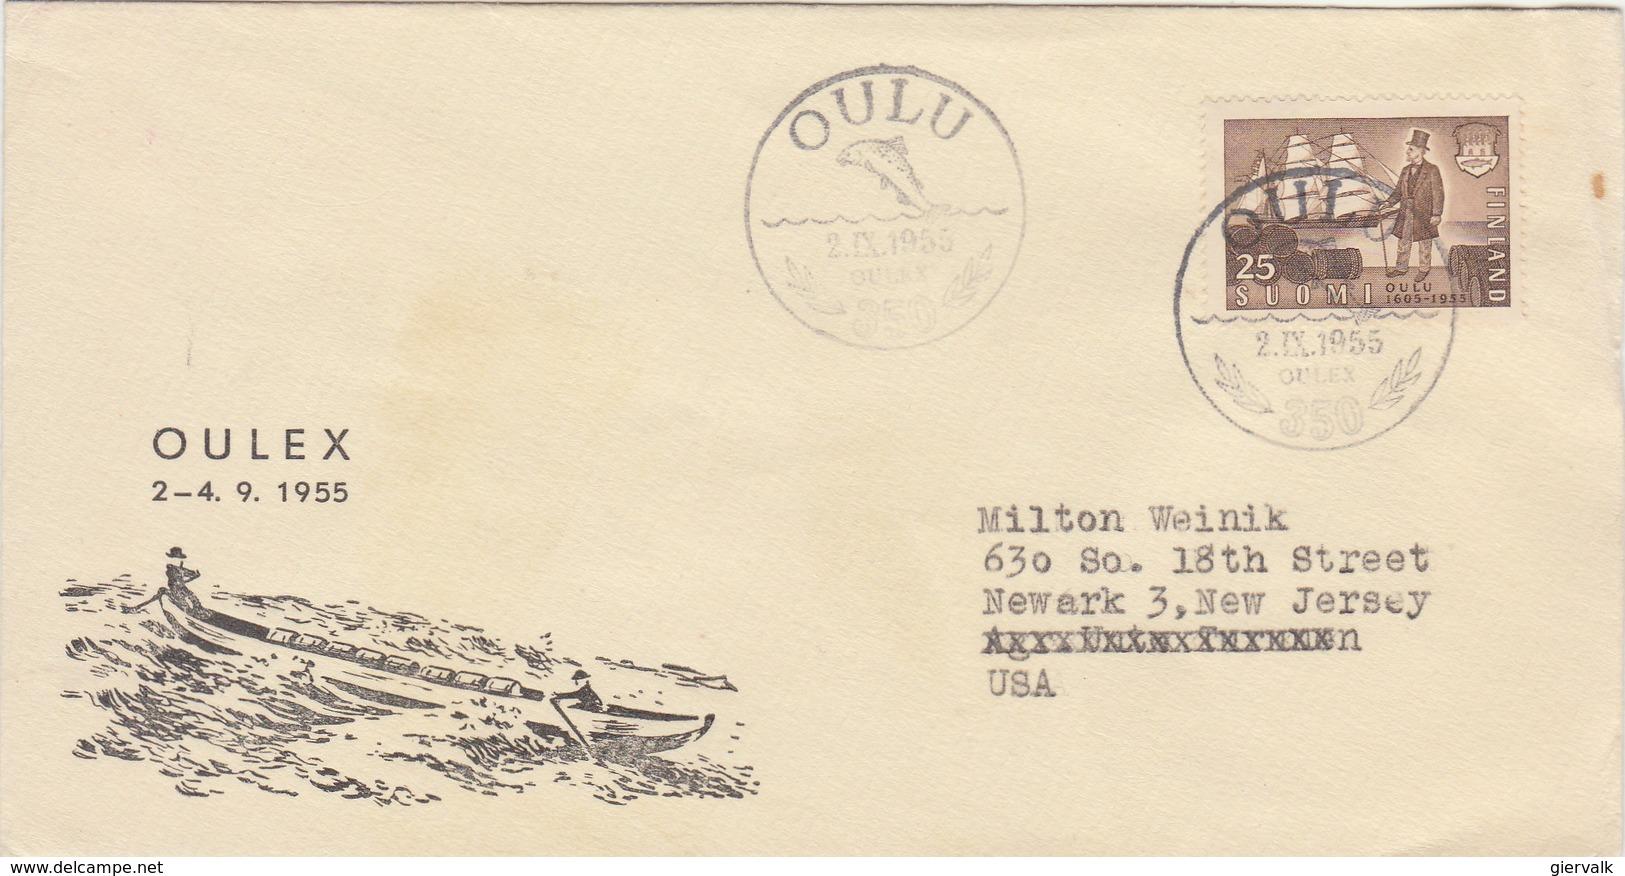 FINLAND 1955 FDC Oulex.BARGAIN.!! - FDC